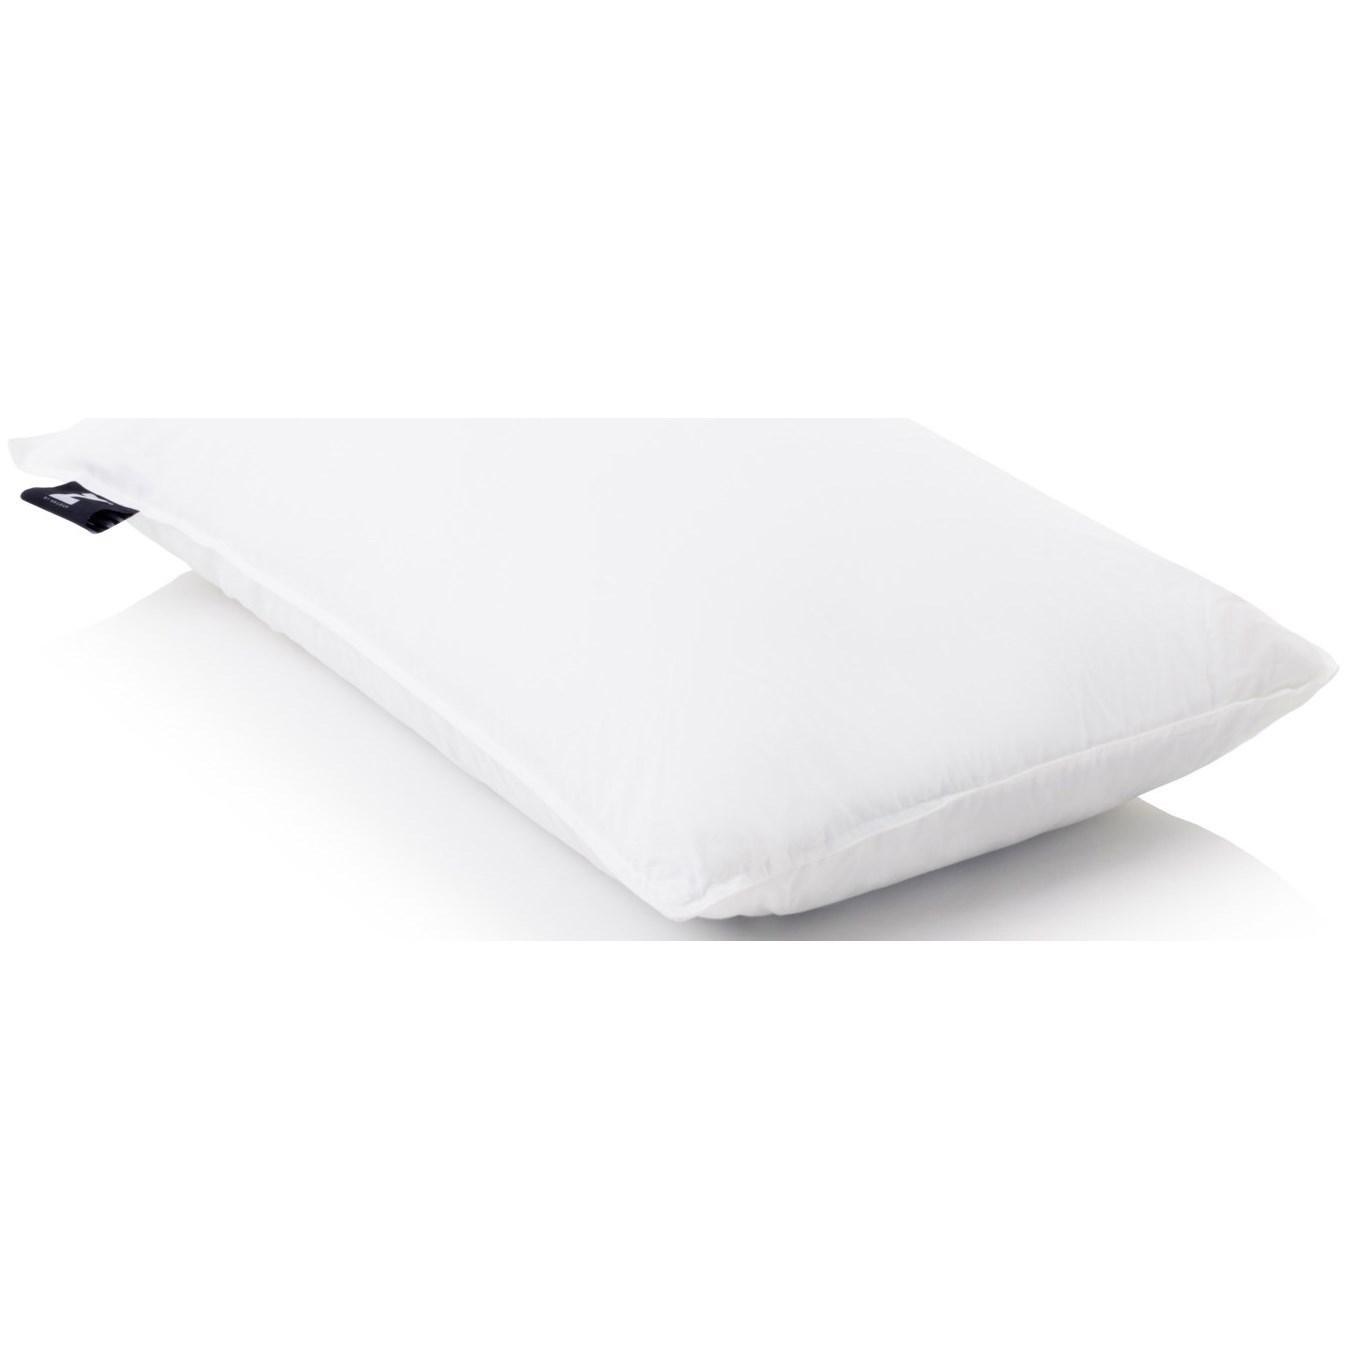 Malouf Shredded Latex and Gelled Microbifer Std Shredded Latex+Gel Microfiber Pillow - Item Number: ZZSSSXGM